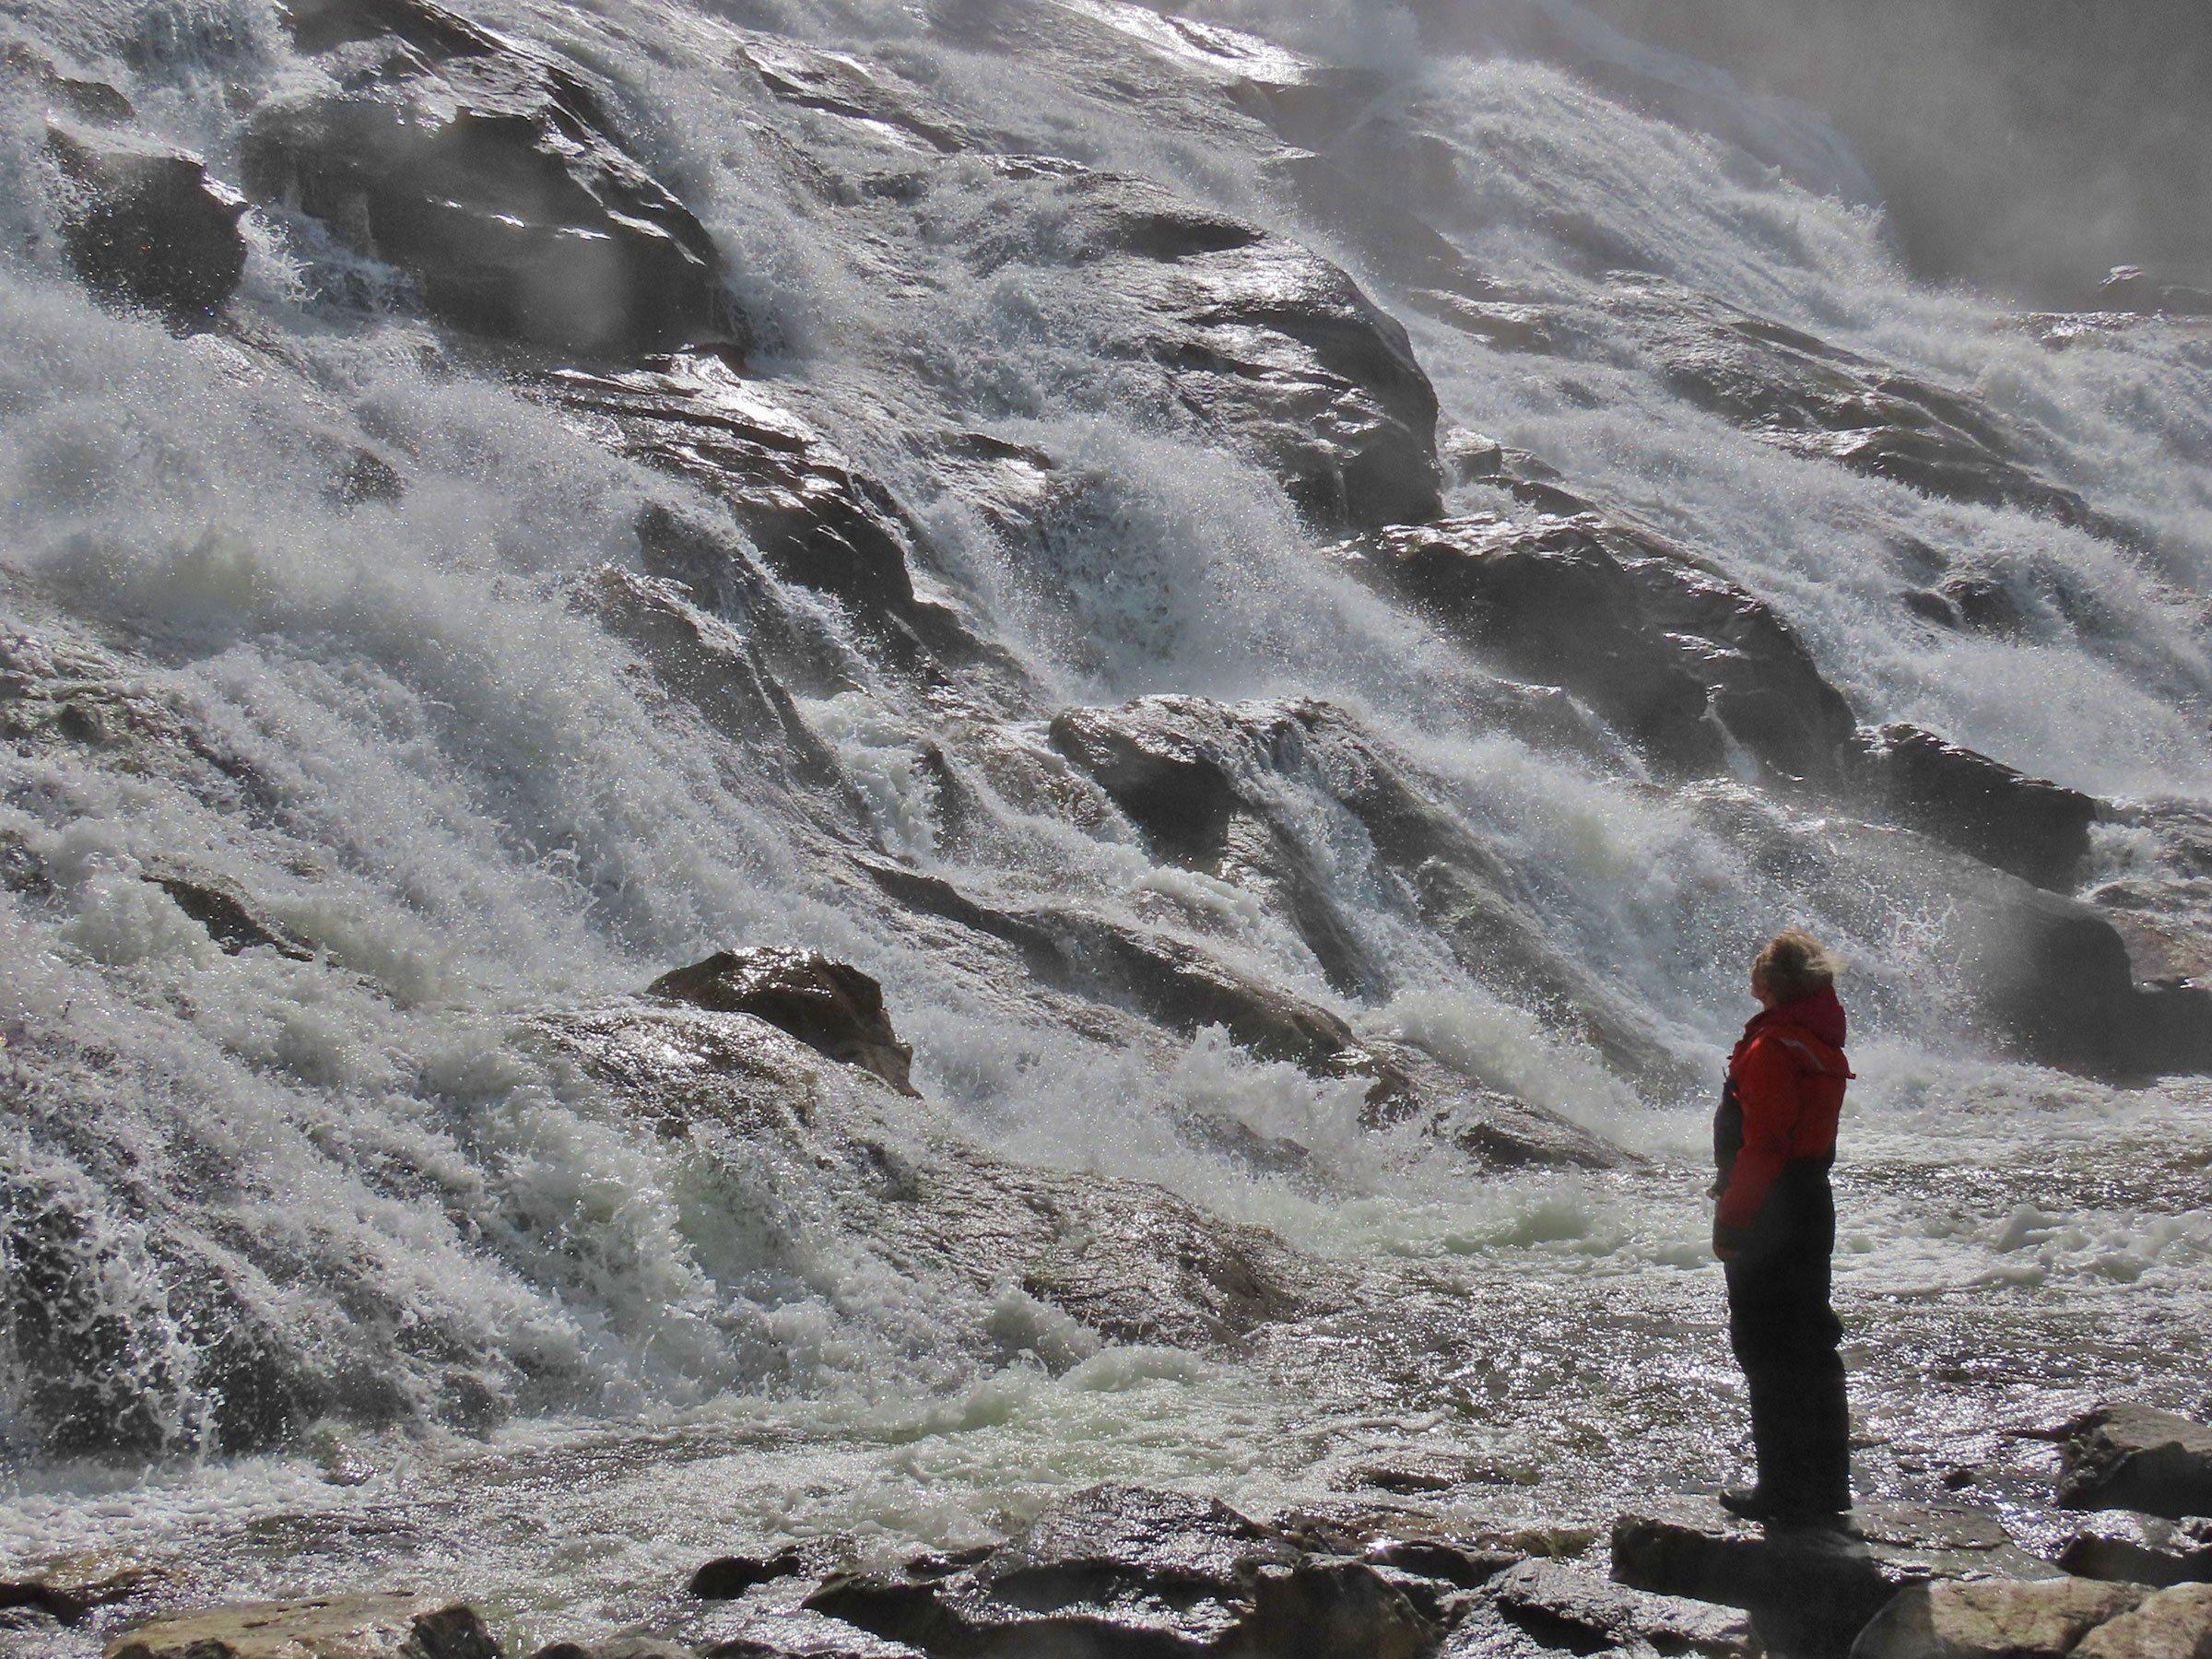 The stupendous flow of Furebergsfossen